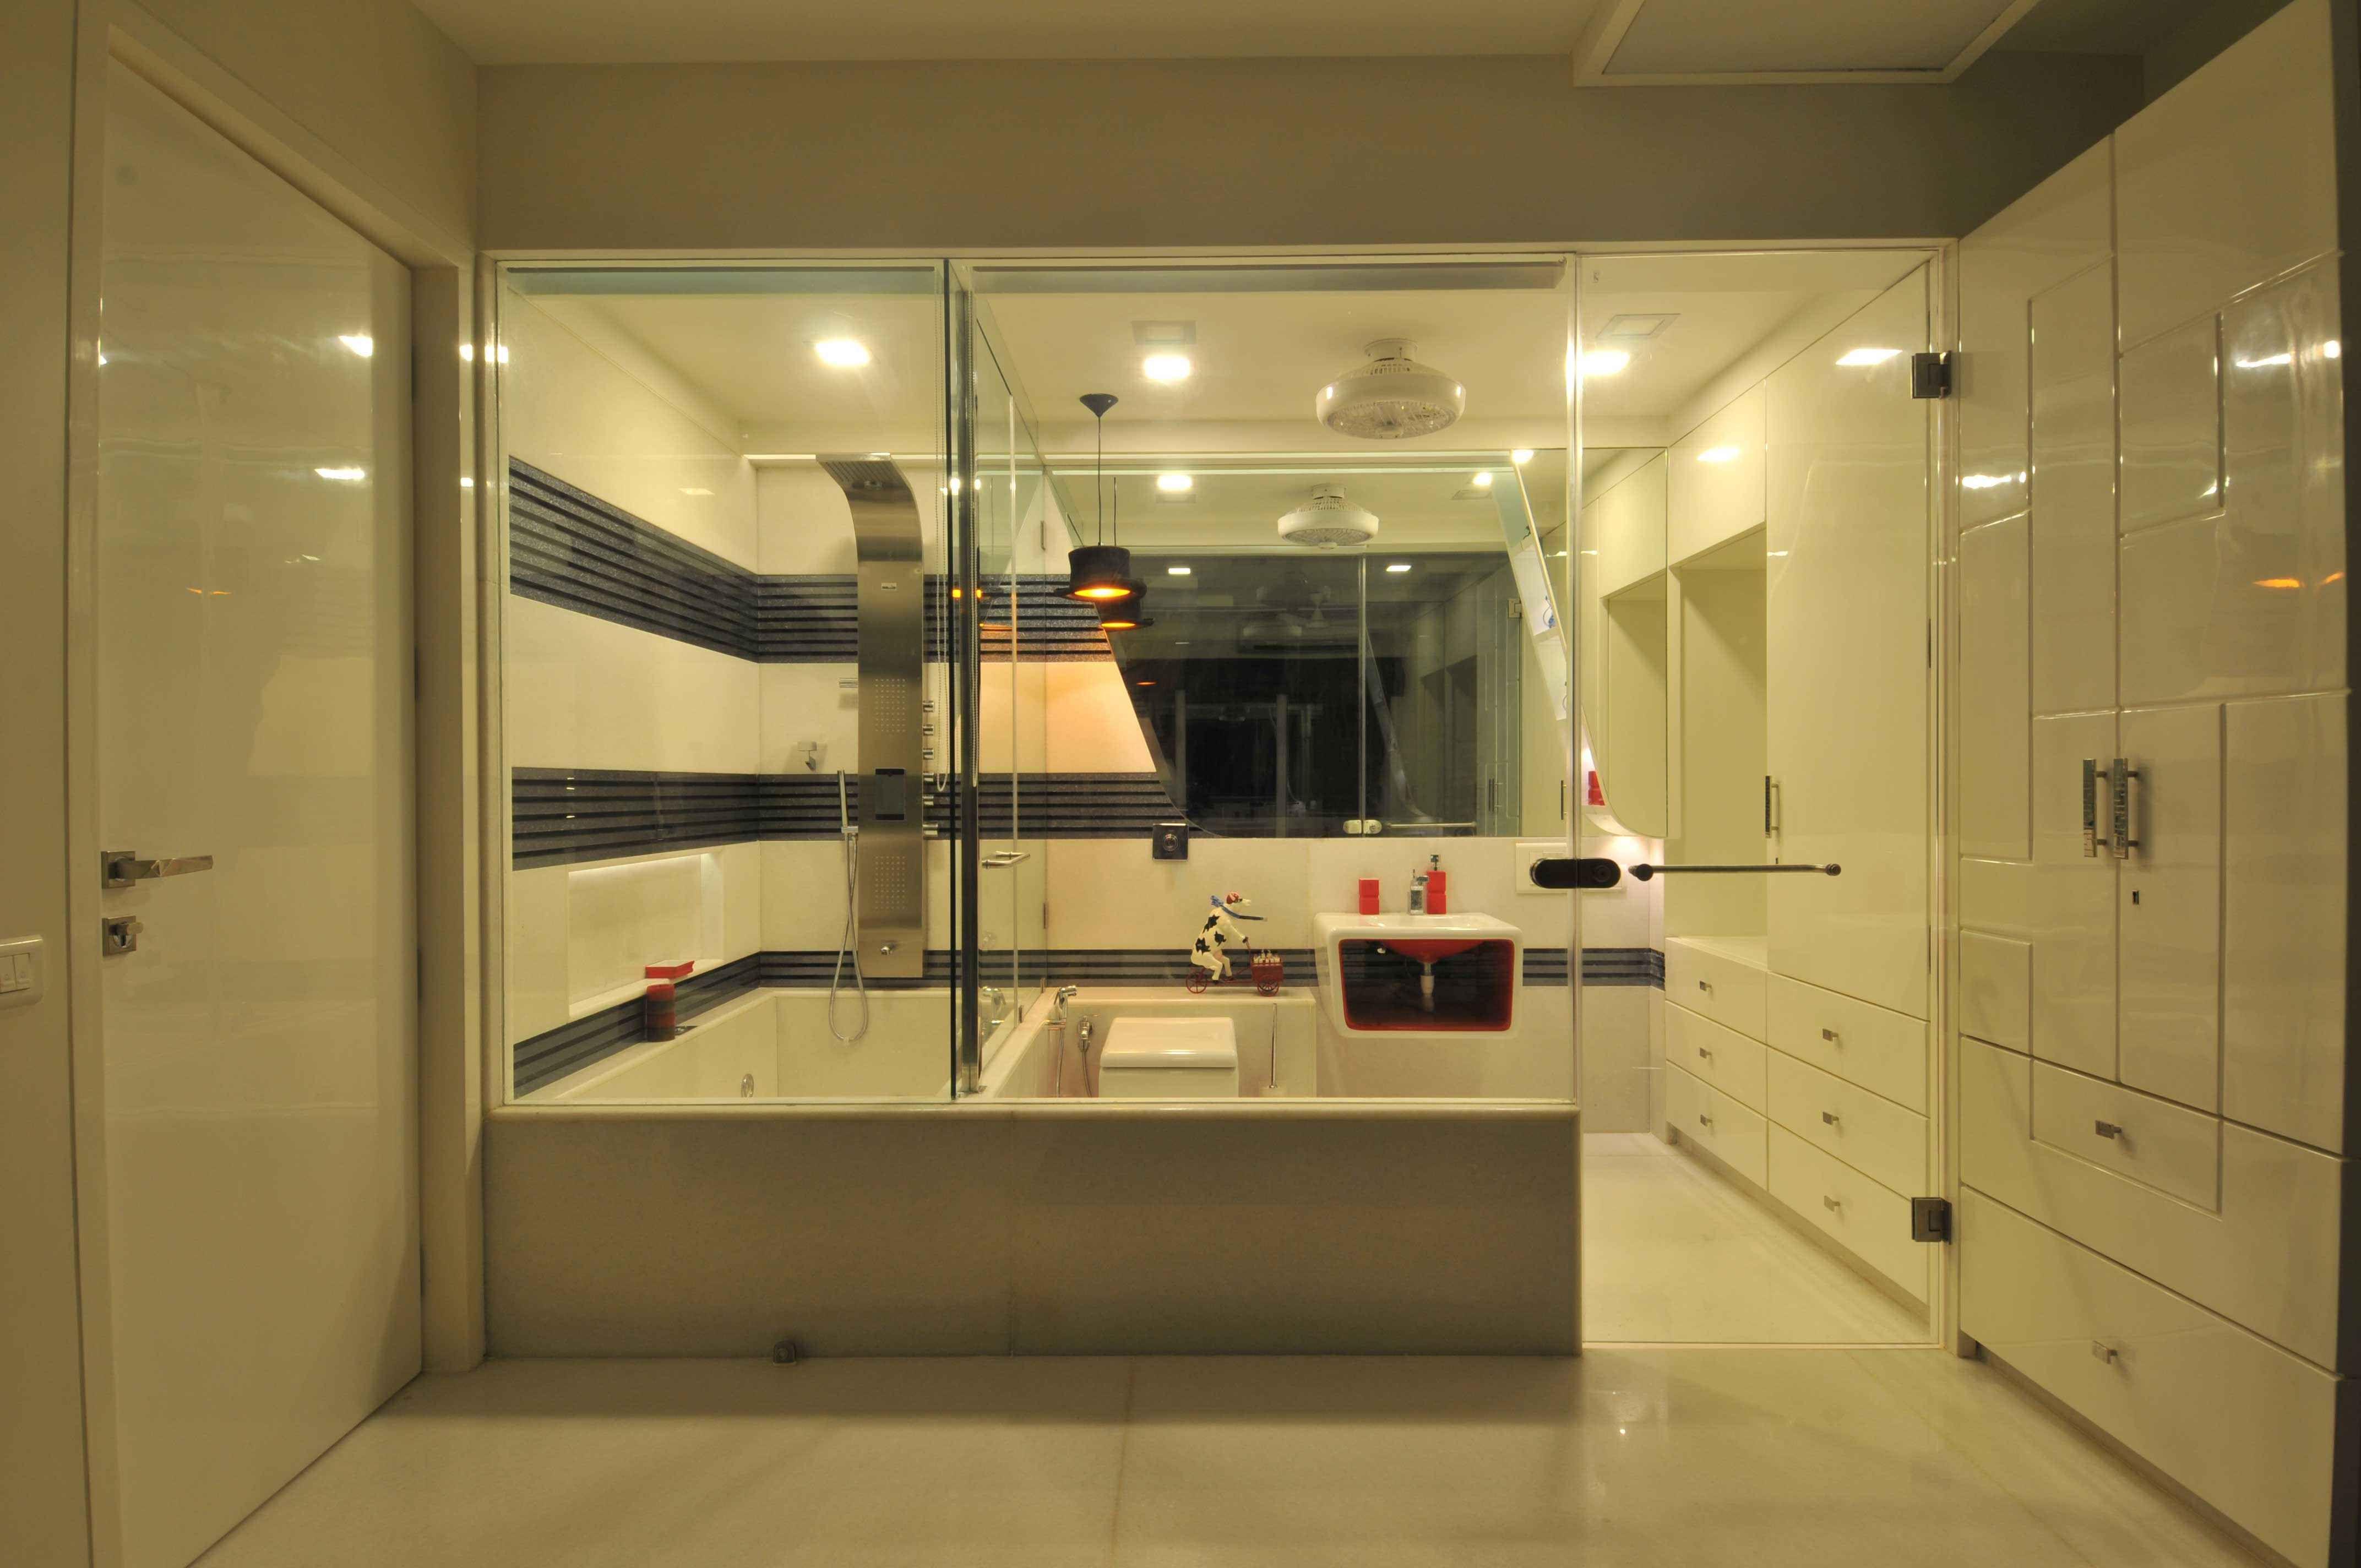 Master bathroom by sonali shah architect in mumbai for Bathroom designs mumbai